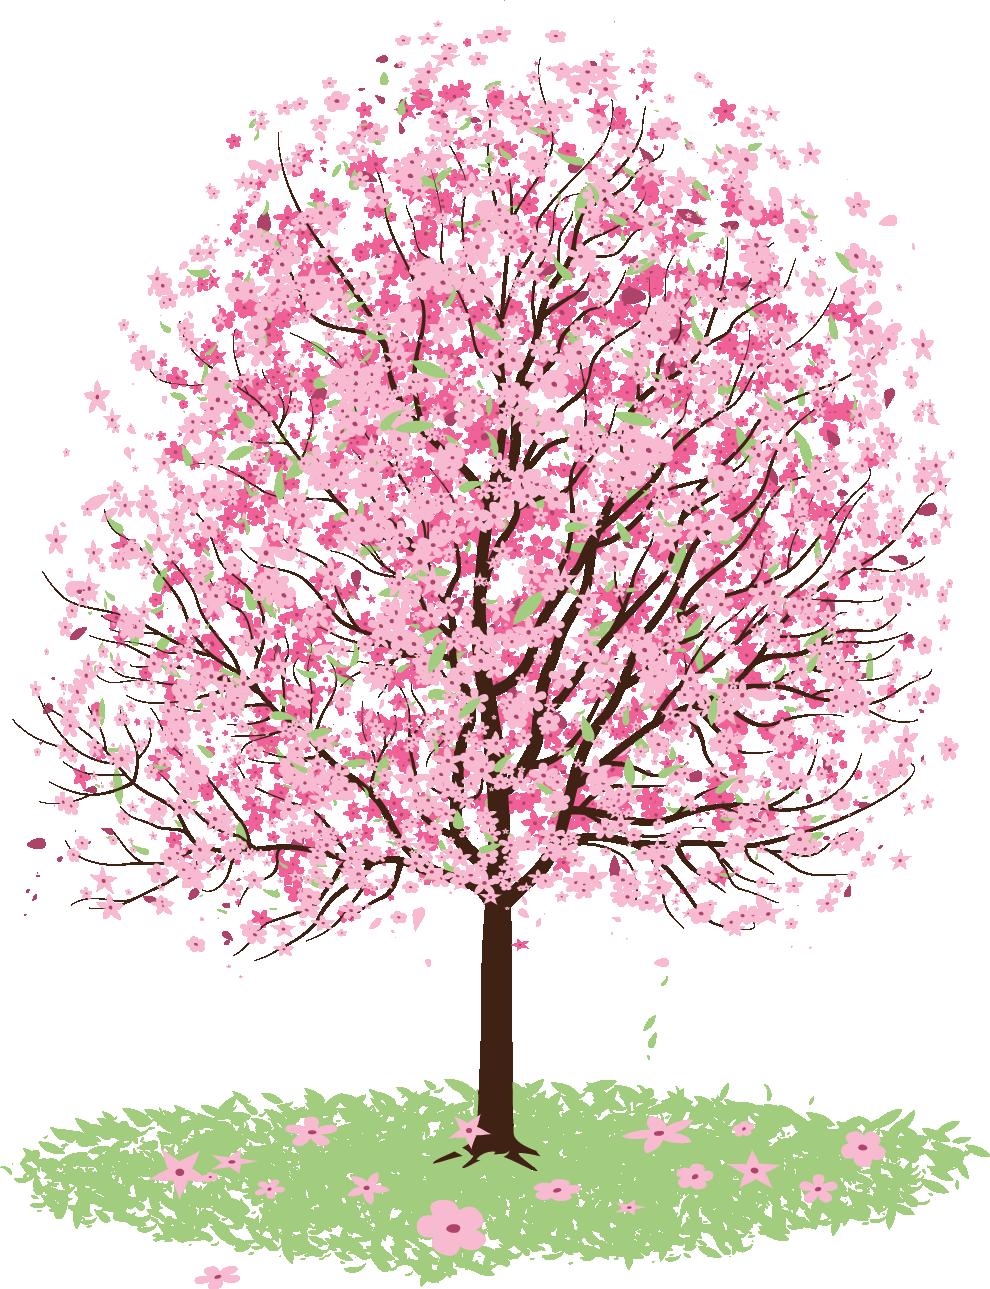 Clipart spring tree image library download Cherry blossom Tree Clip art - sakura 990*1289 transprent Png Free ... image library download